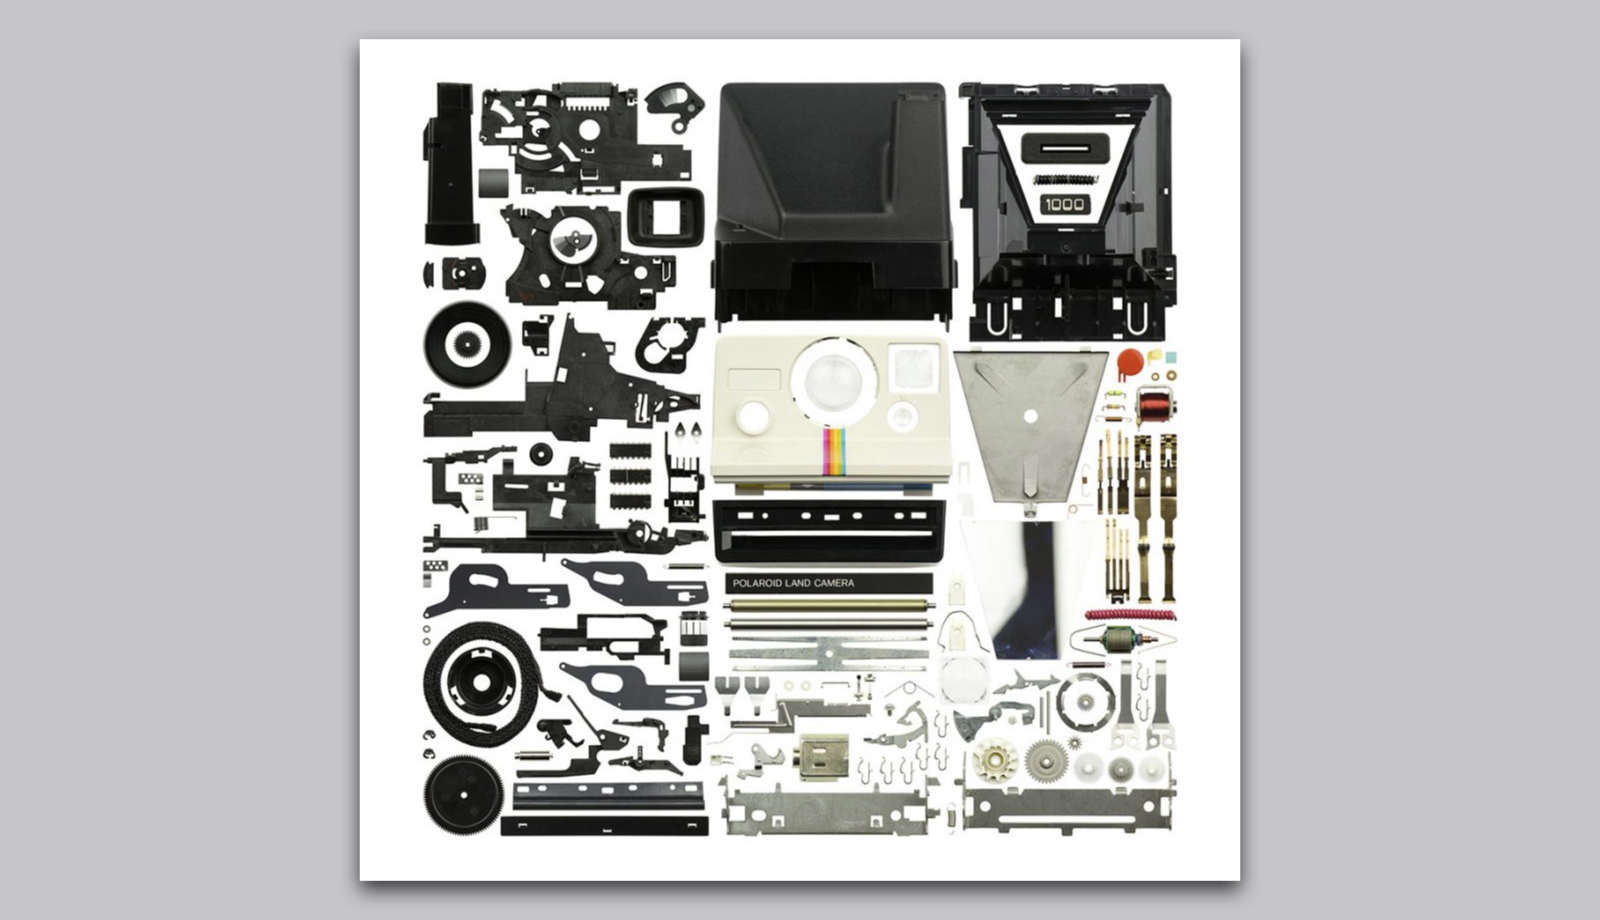 181129_Designkritik_ReneSpitz_md-SpotOnDesign_Polaroid